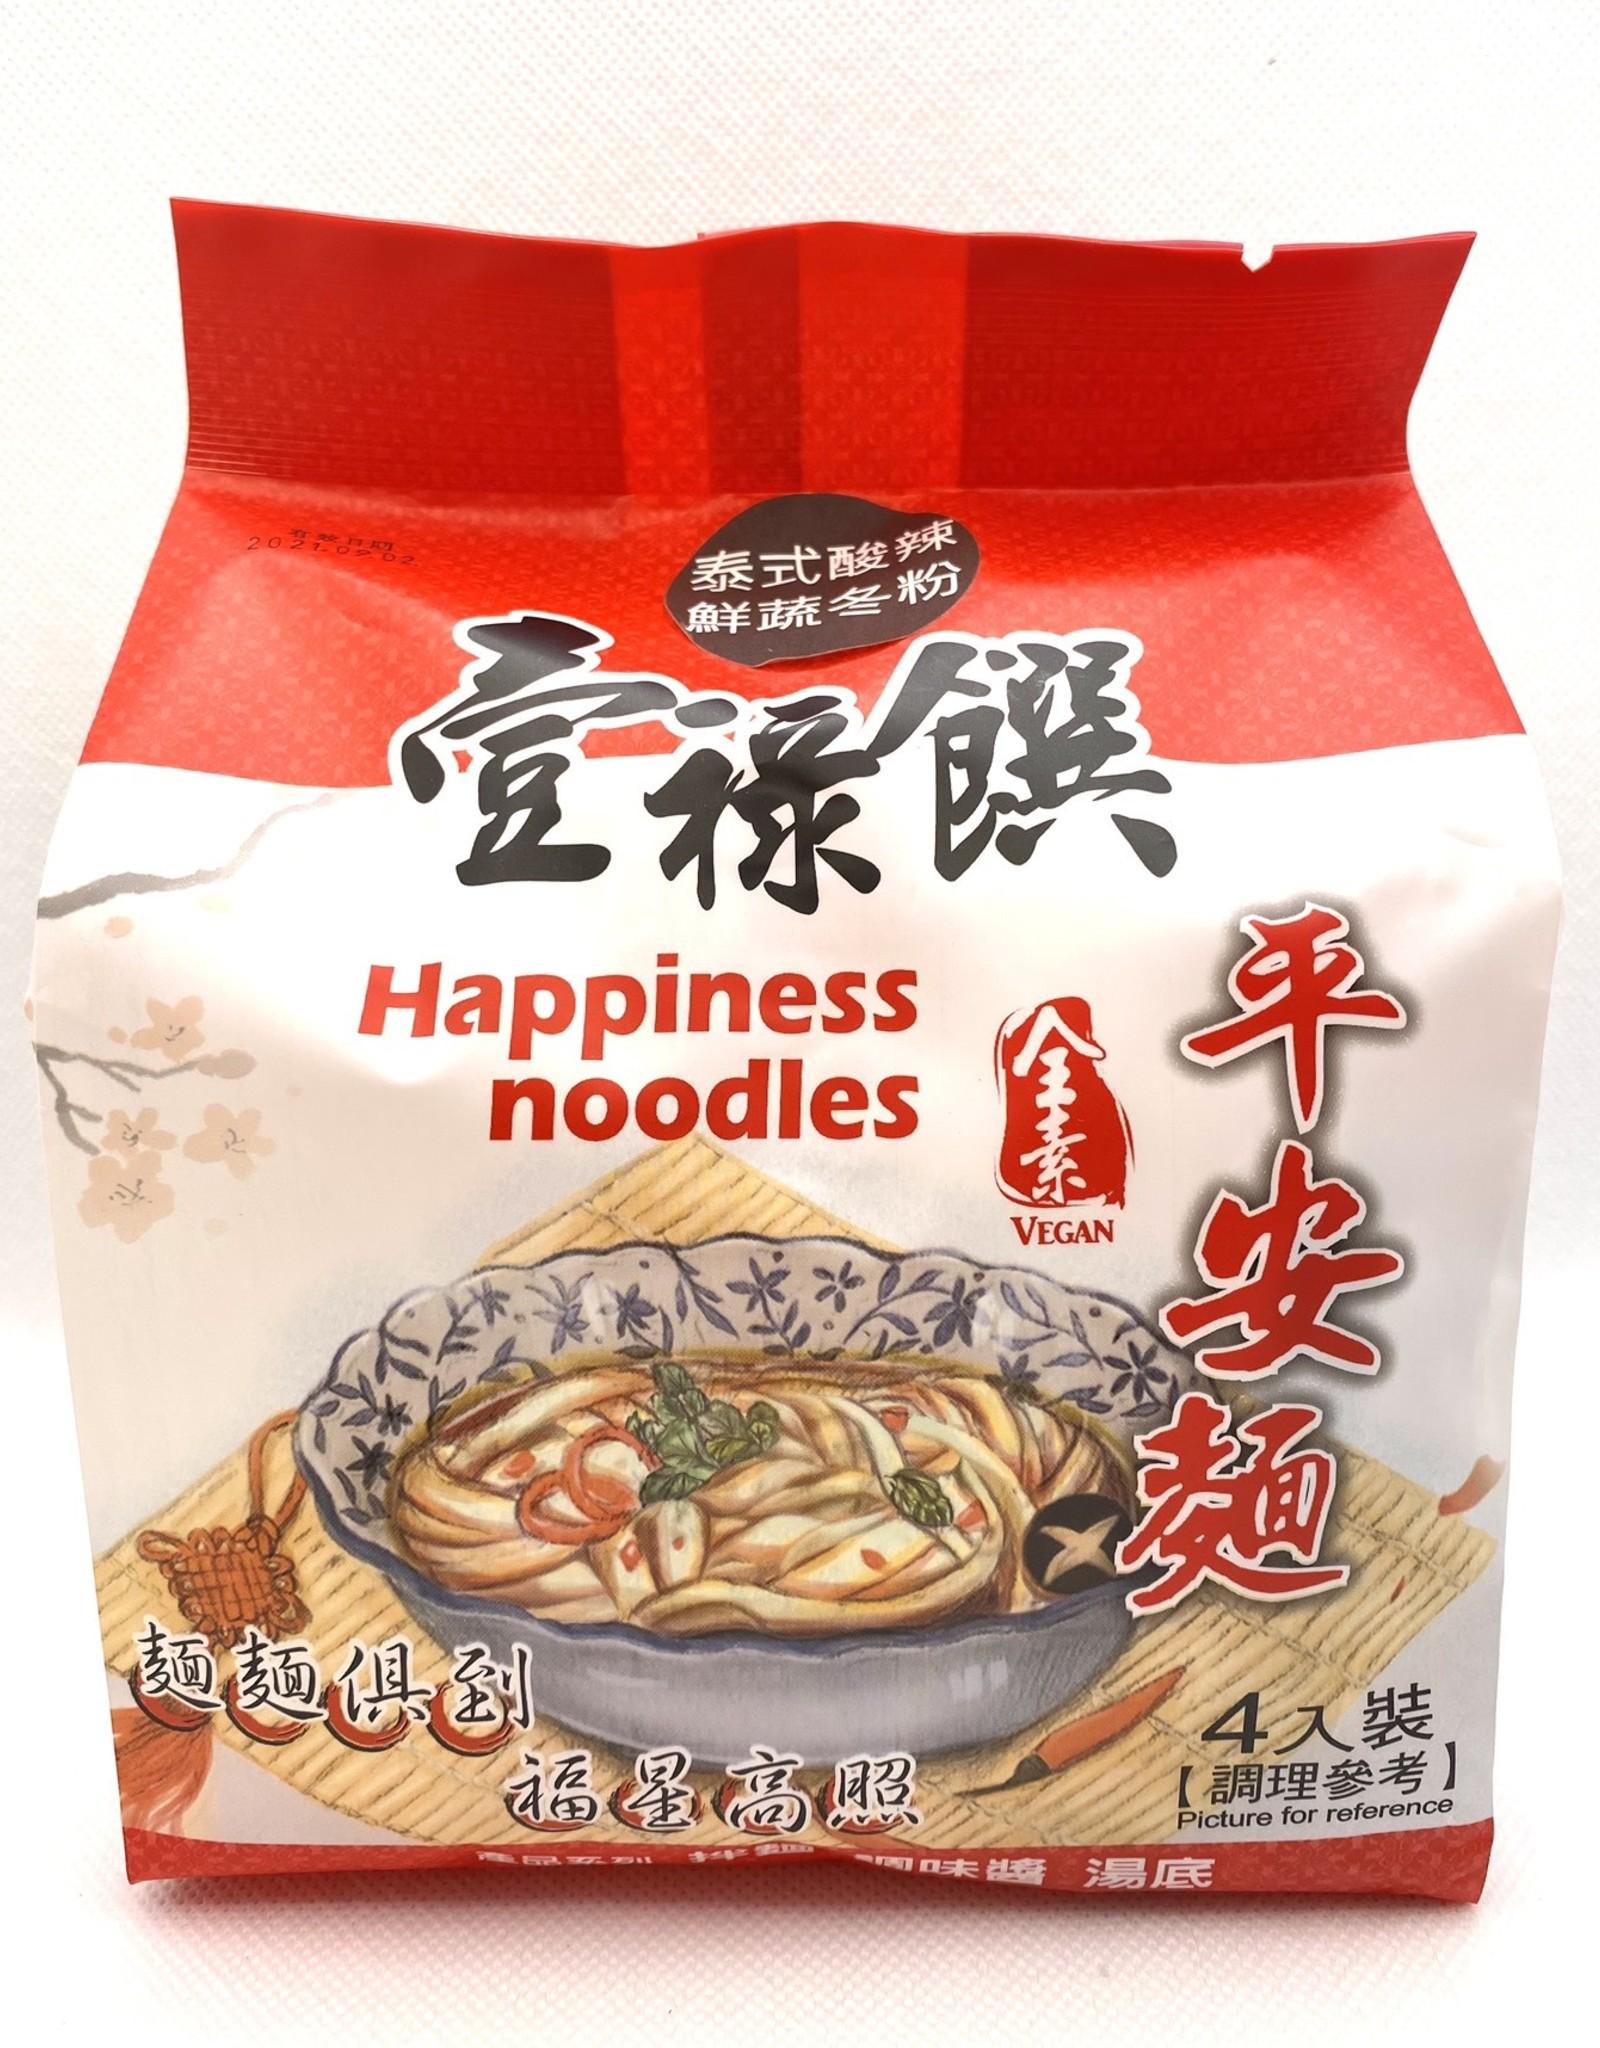 Immense * 壹善 (HI) Vegan Thai Hot and Sour Mung Bean Noodles*(壹祿饌) 泰式酸辣鮮蔬冬粉